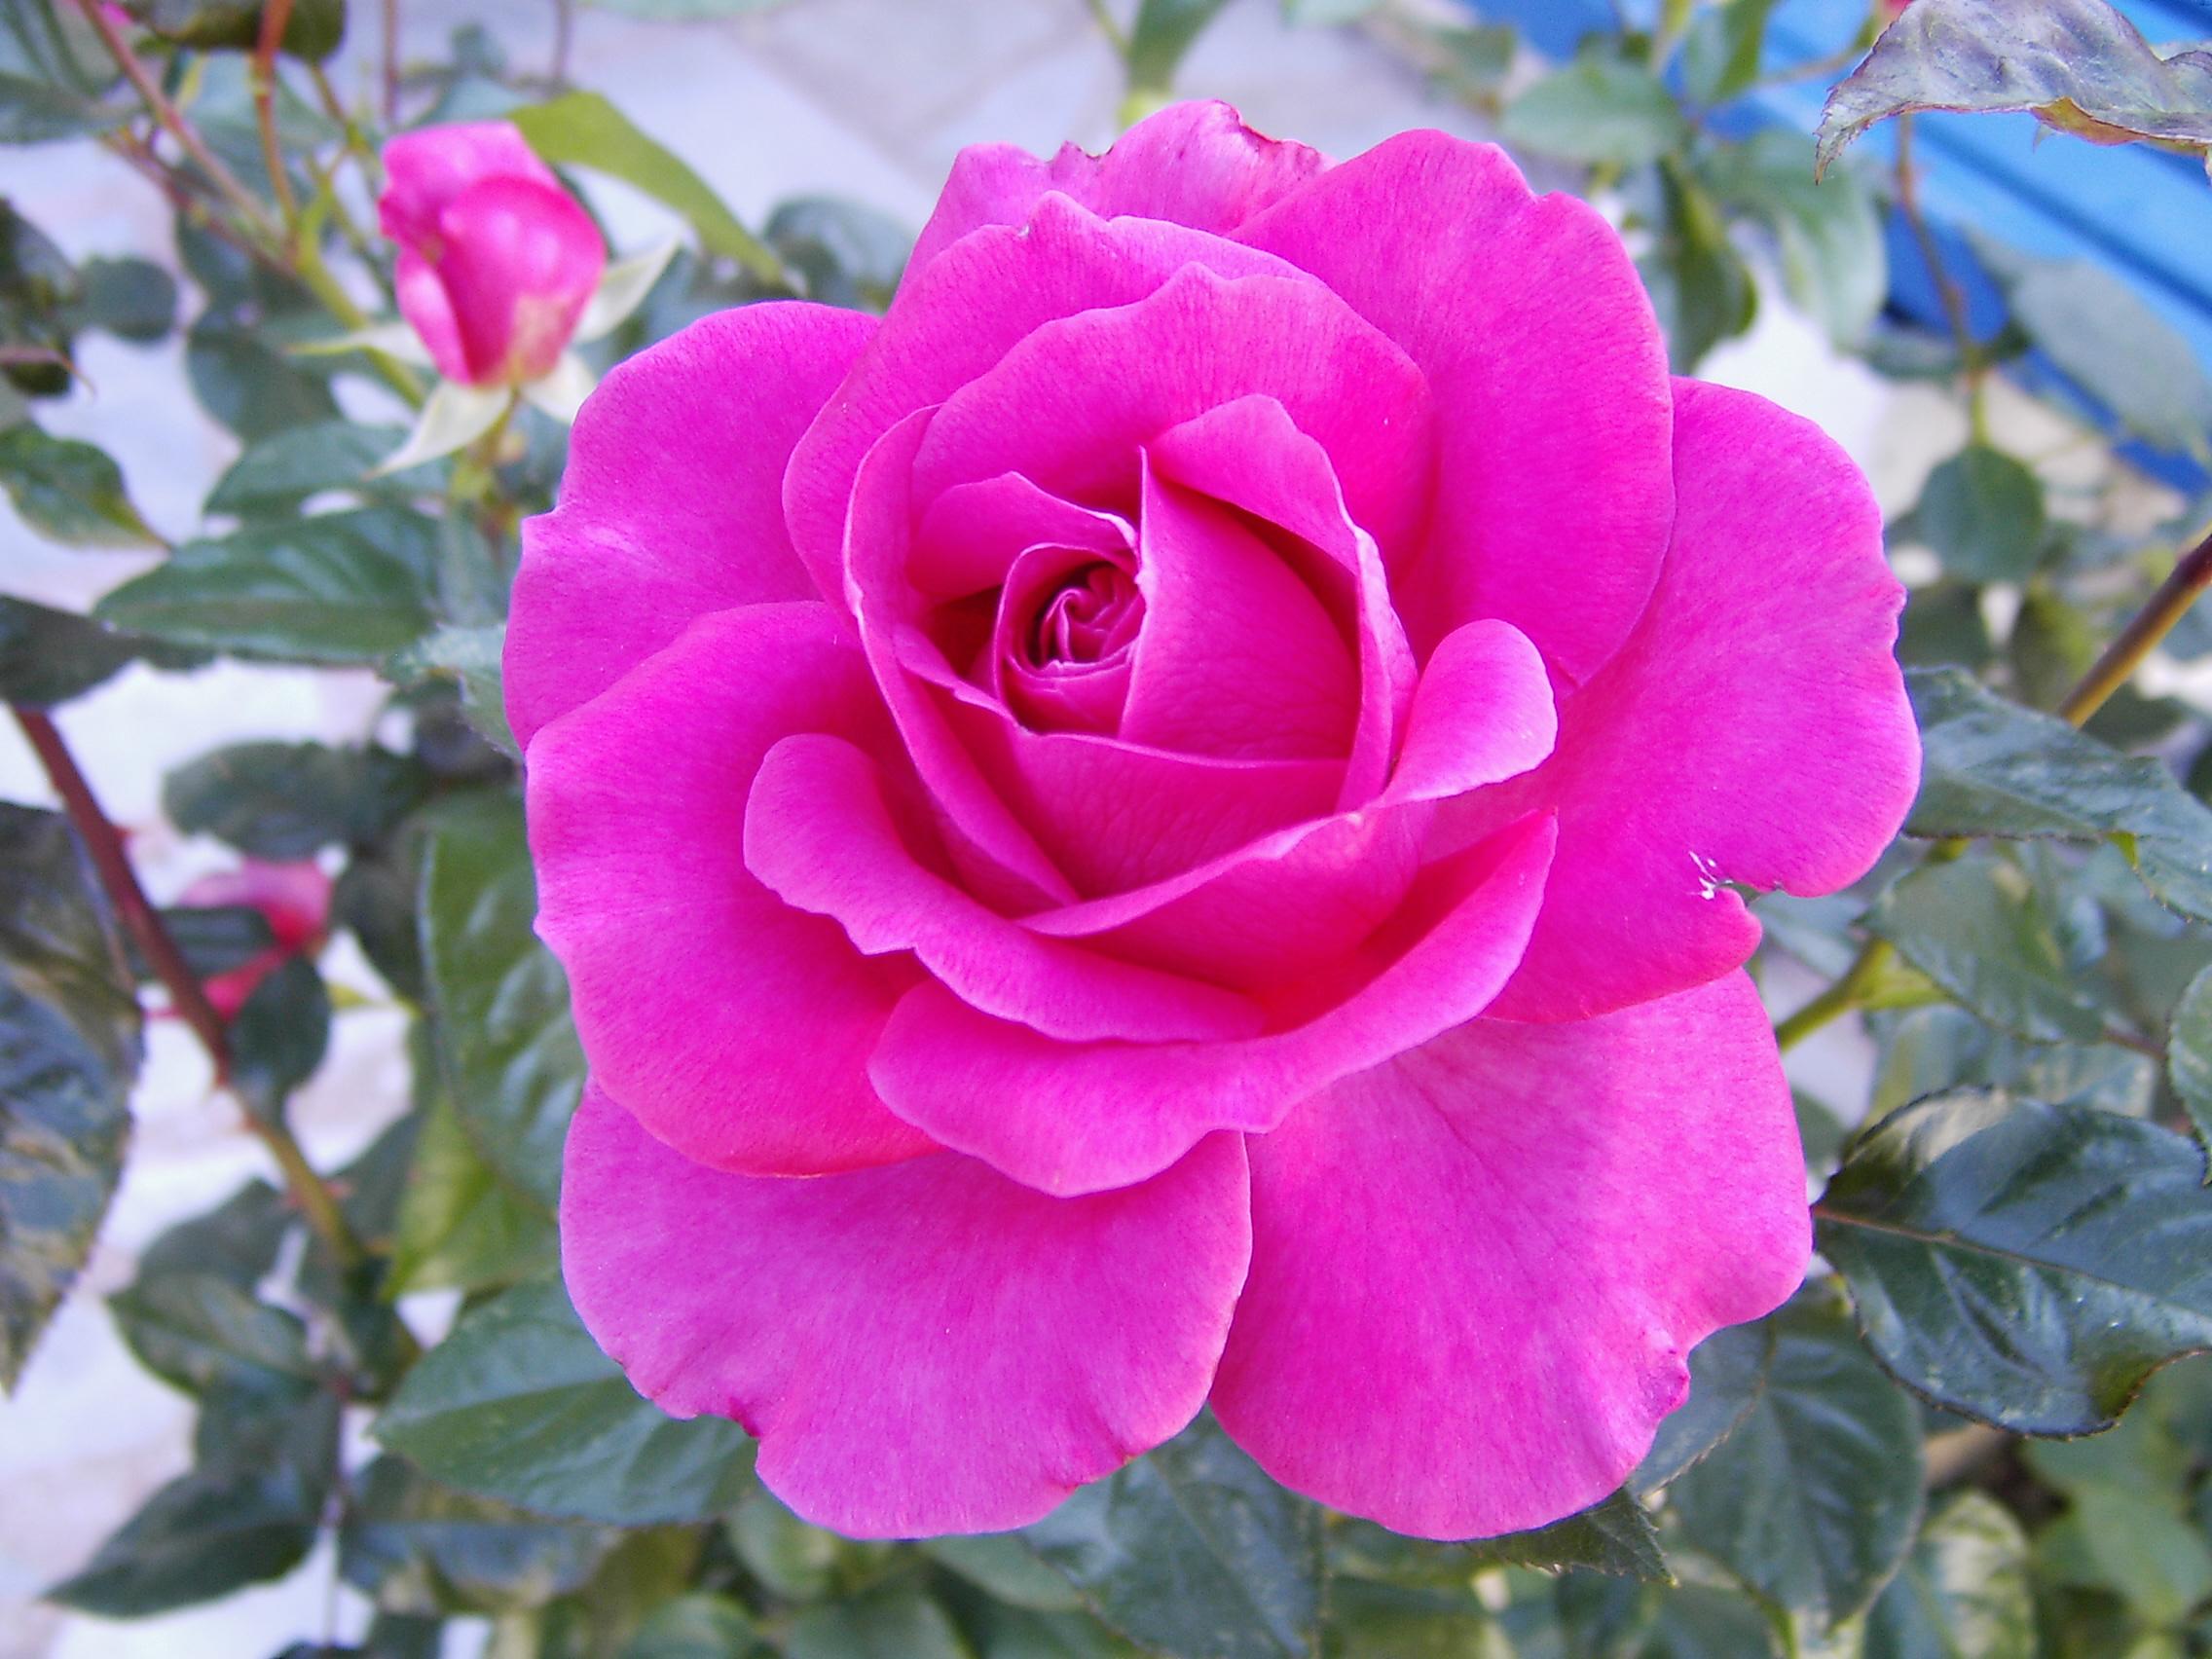 magenta roses wallpaper - photo #21